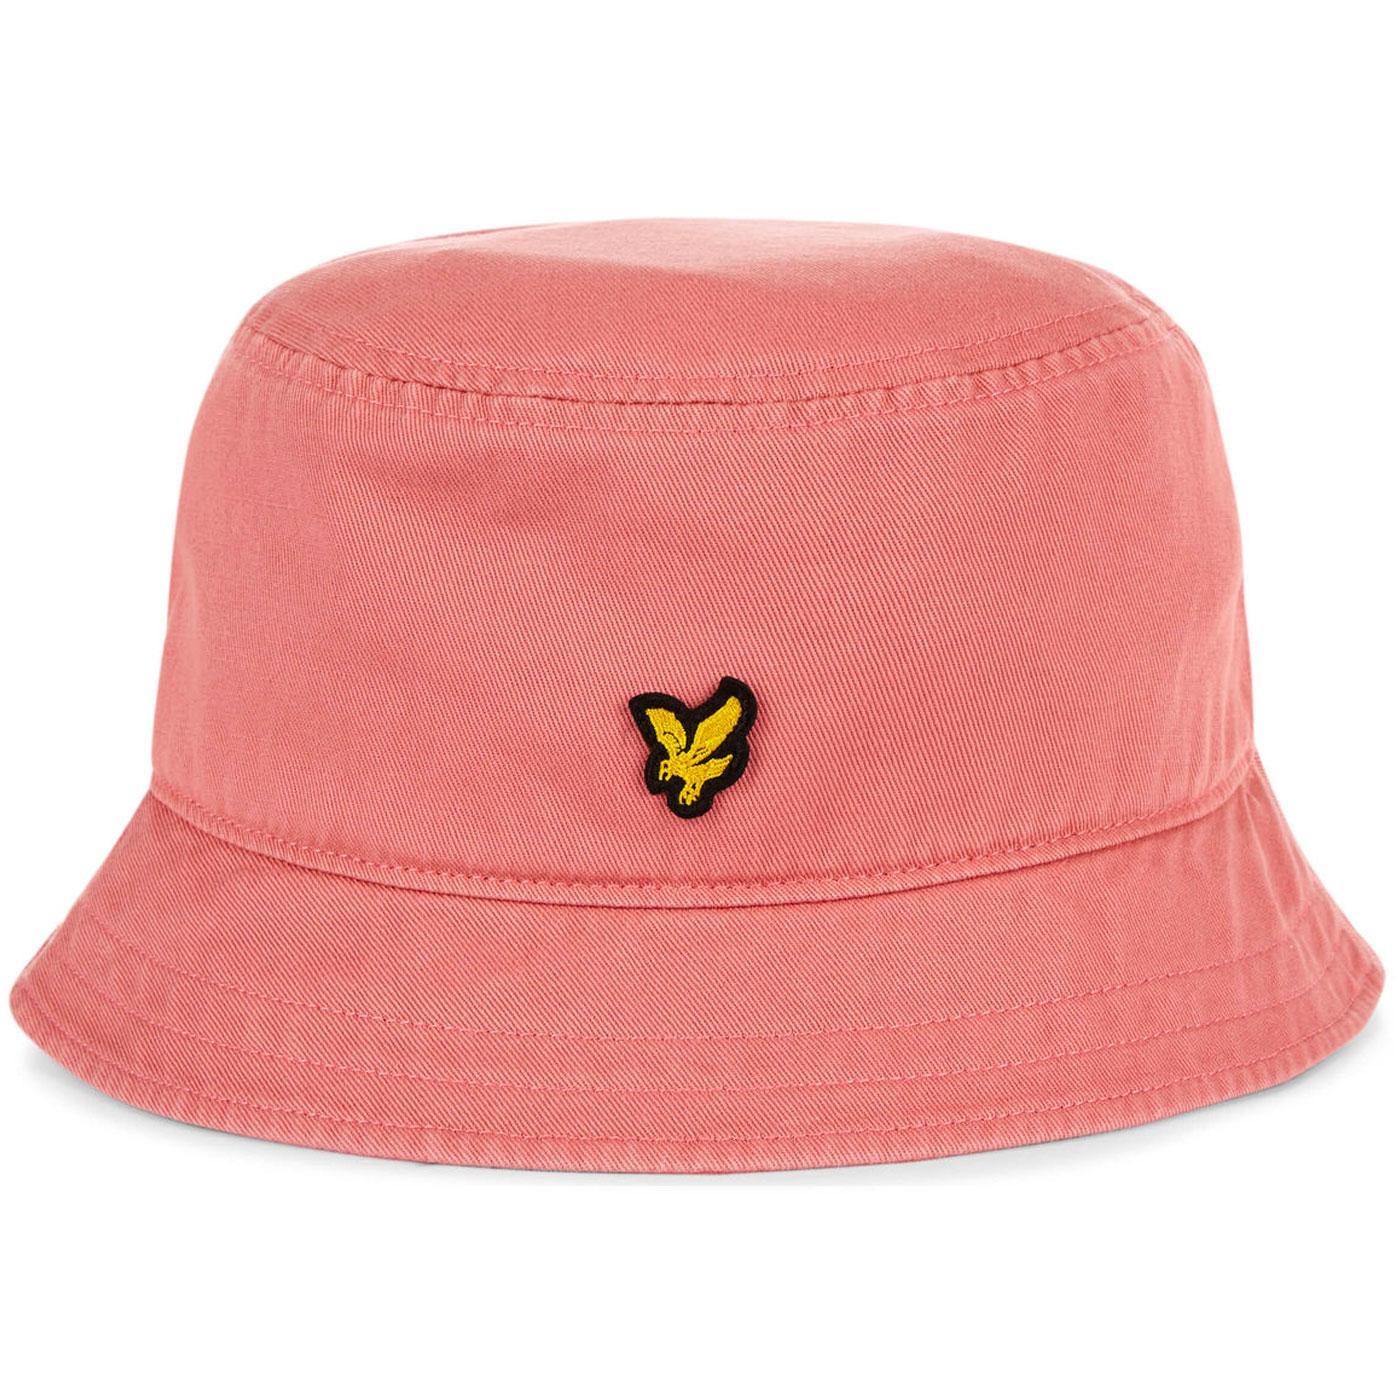 LYLE & SCOTT Retro Washed Twill Bucket Hat (PS)